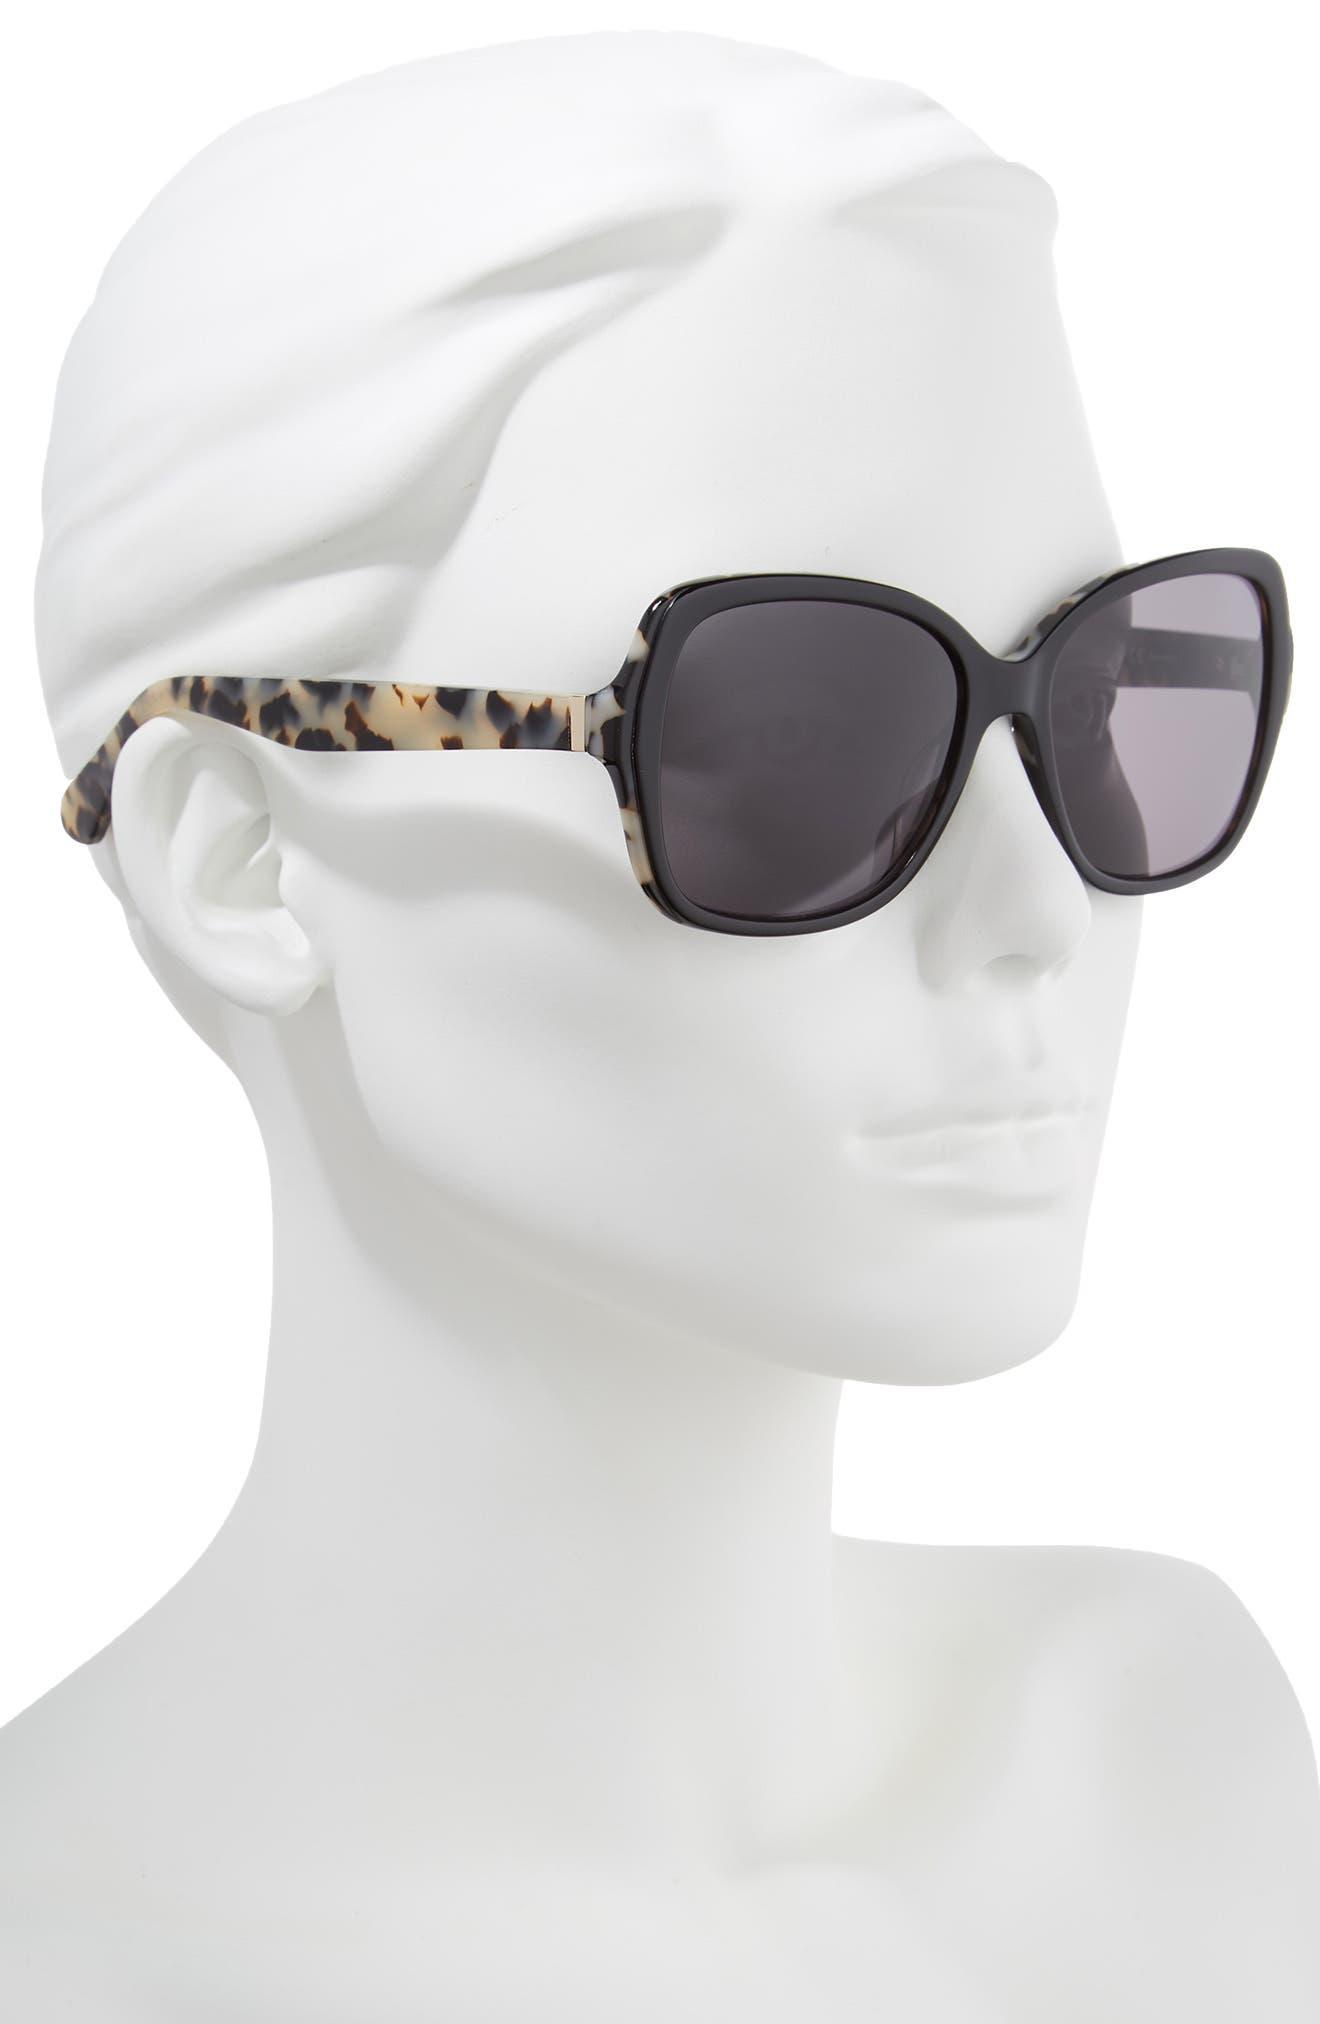 karalyns 56mm polarized sunglasses,                             Alternate thumbnail 2, color,                             BLACK HAVANA POLAR